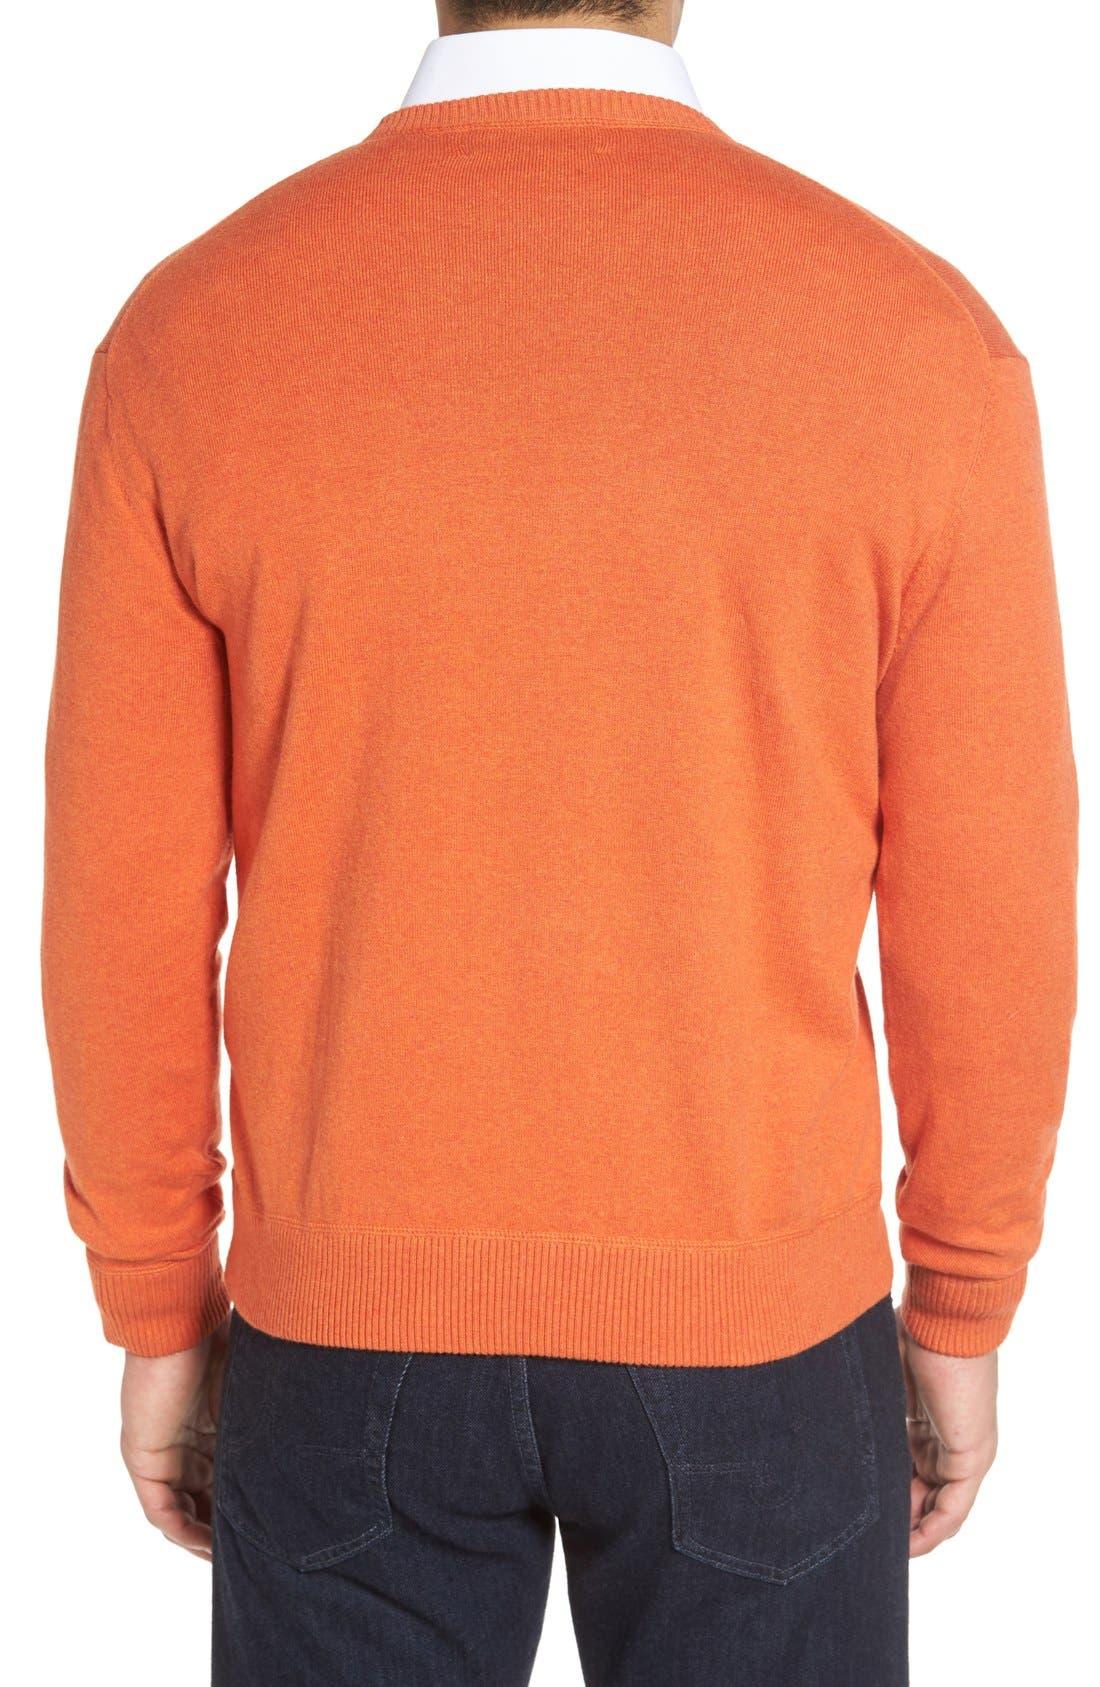 'Jersey Sport' Cotton Blend Crewneck Sweater,                             Alternate thumbnail 15, color,